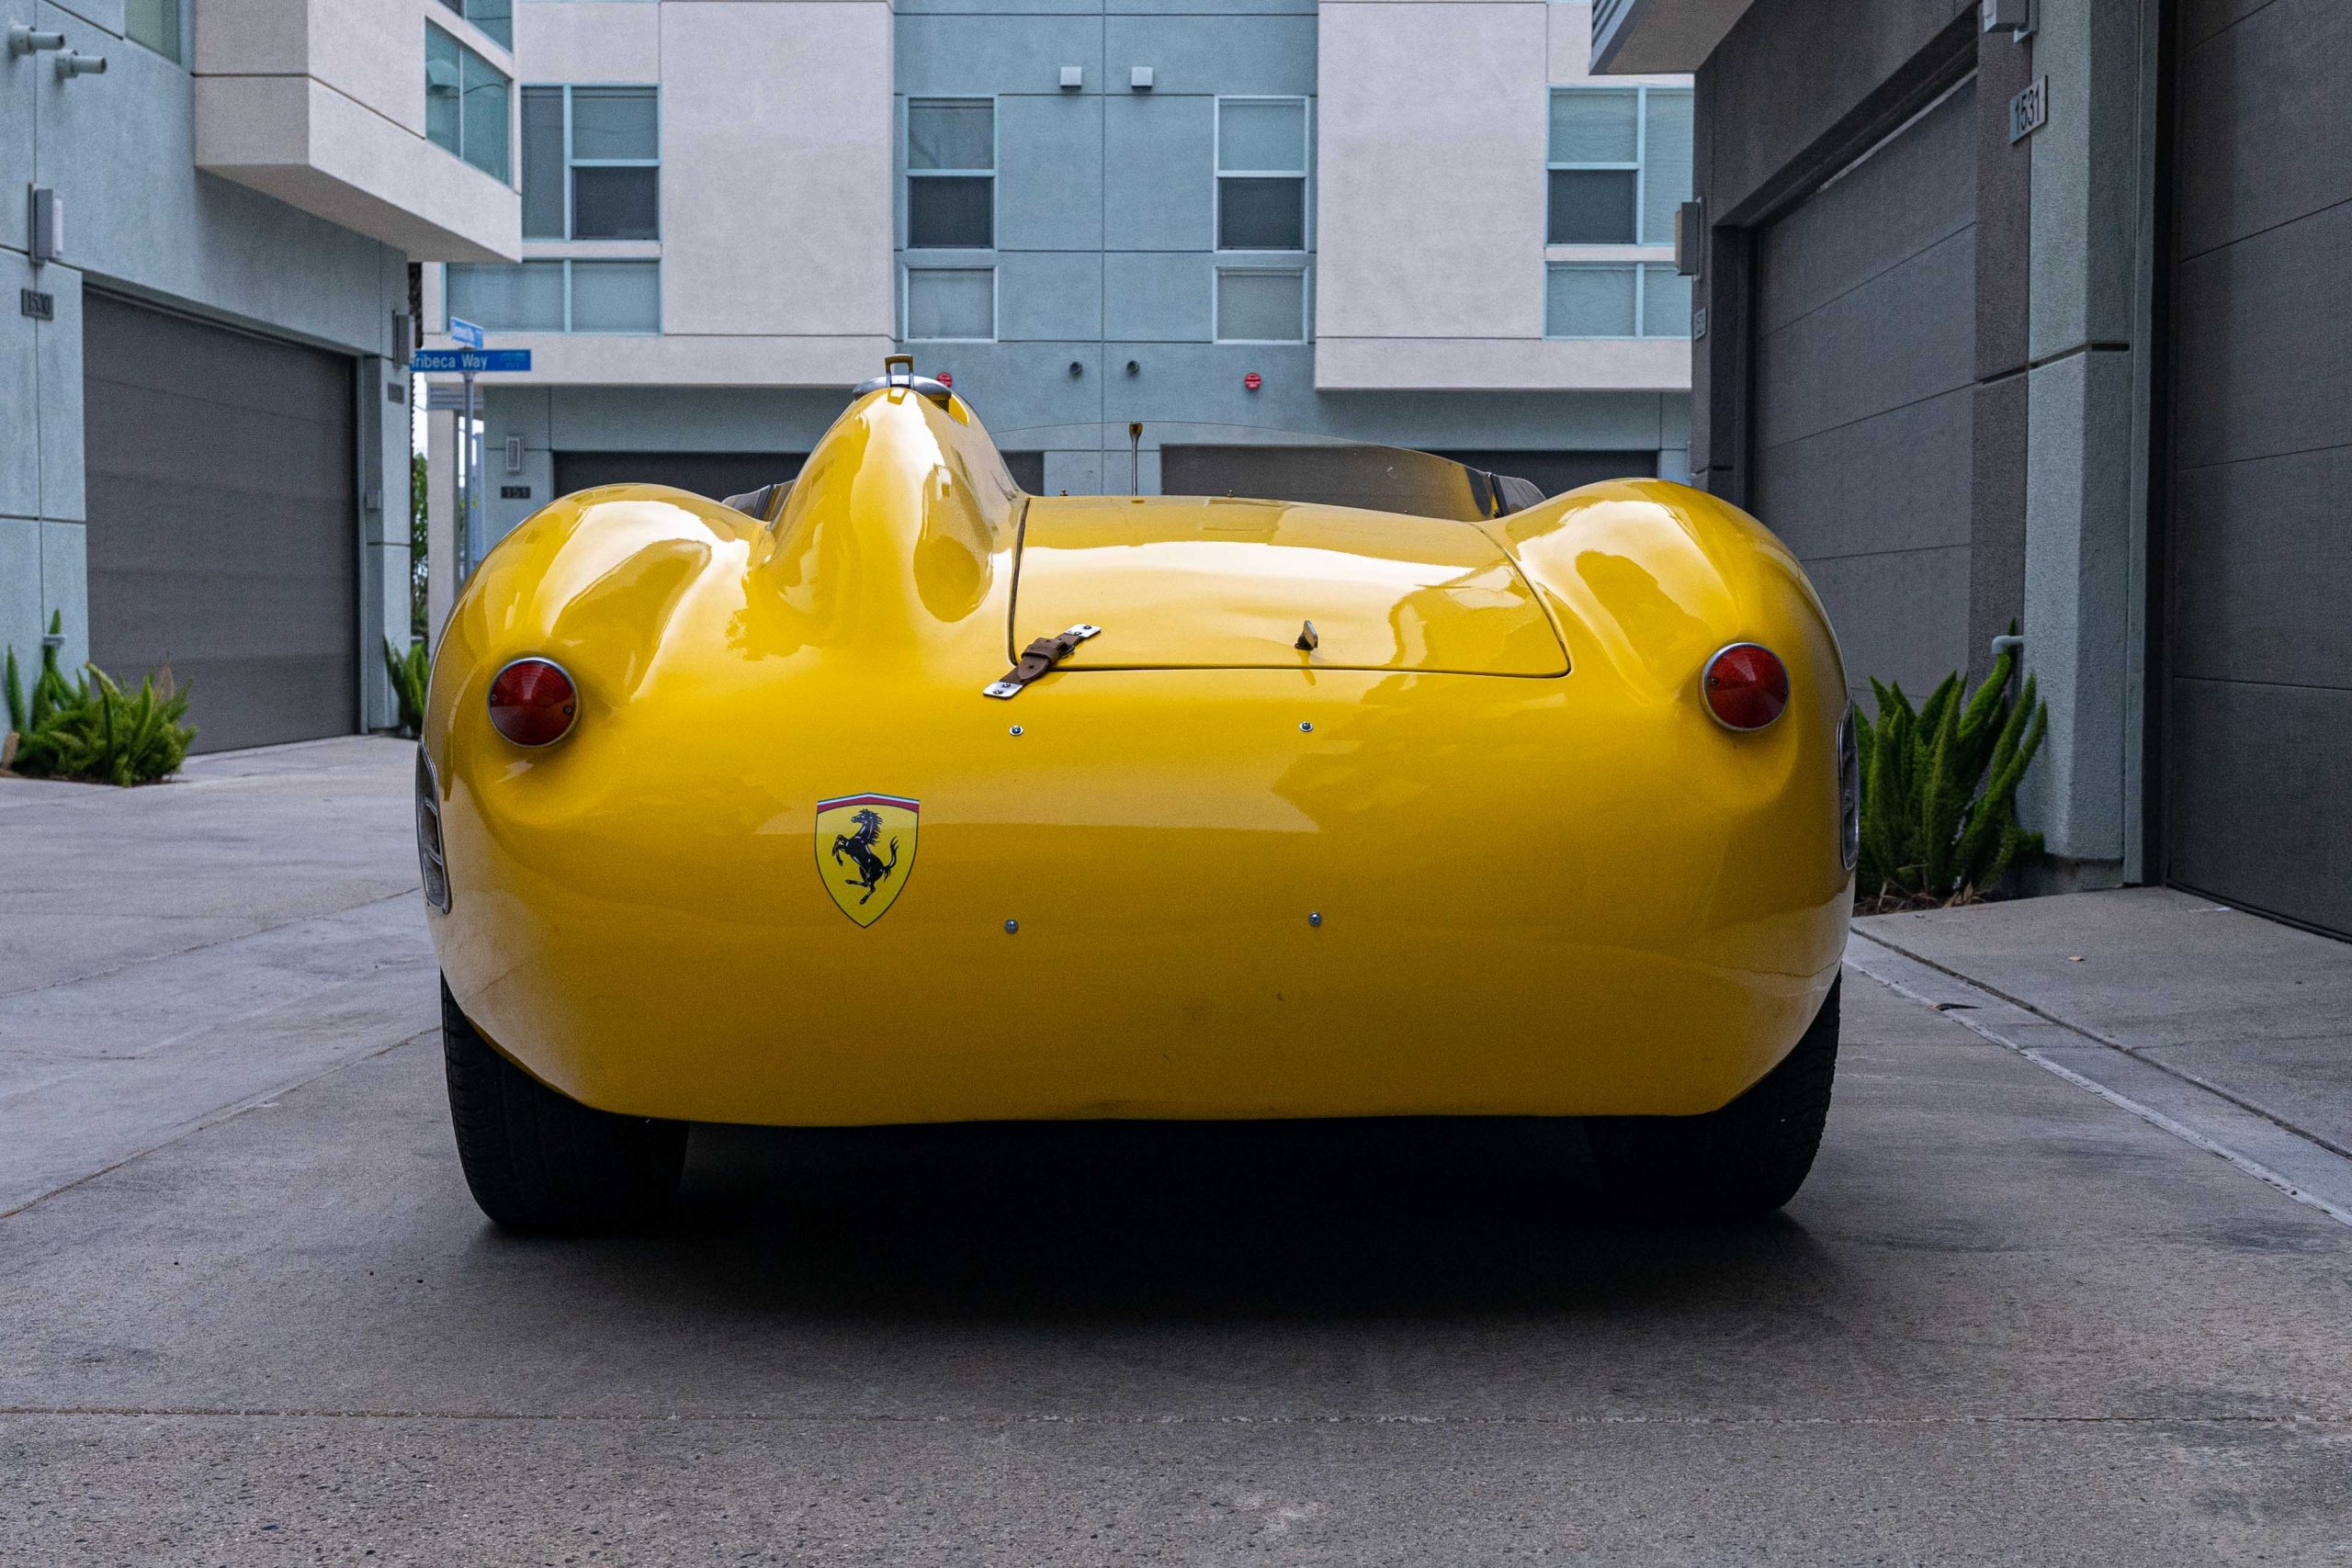 1957 Ferrari 196 SP Rear View